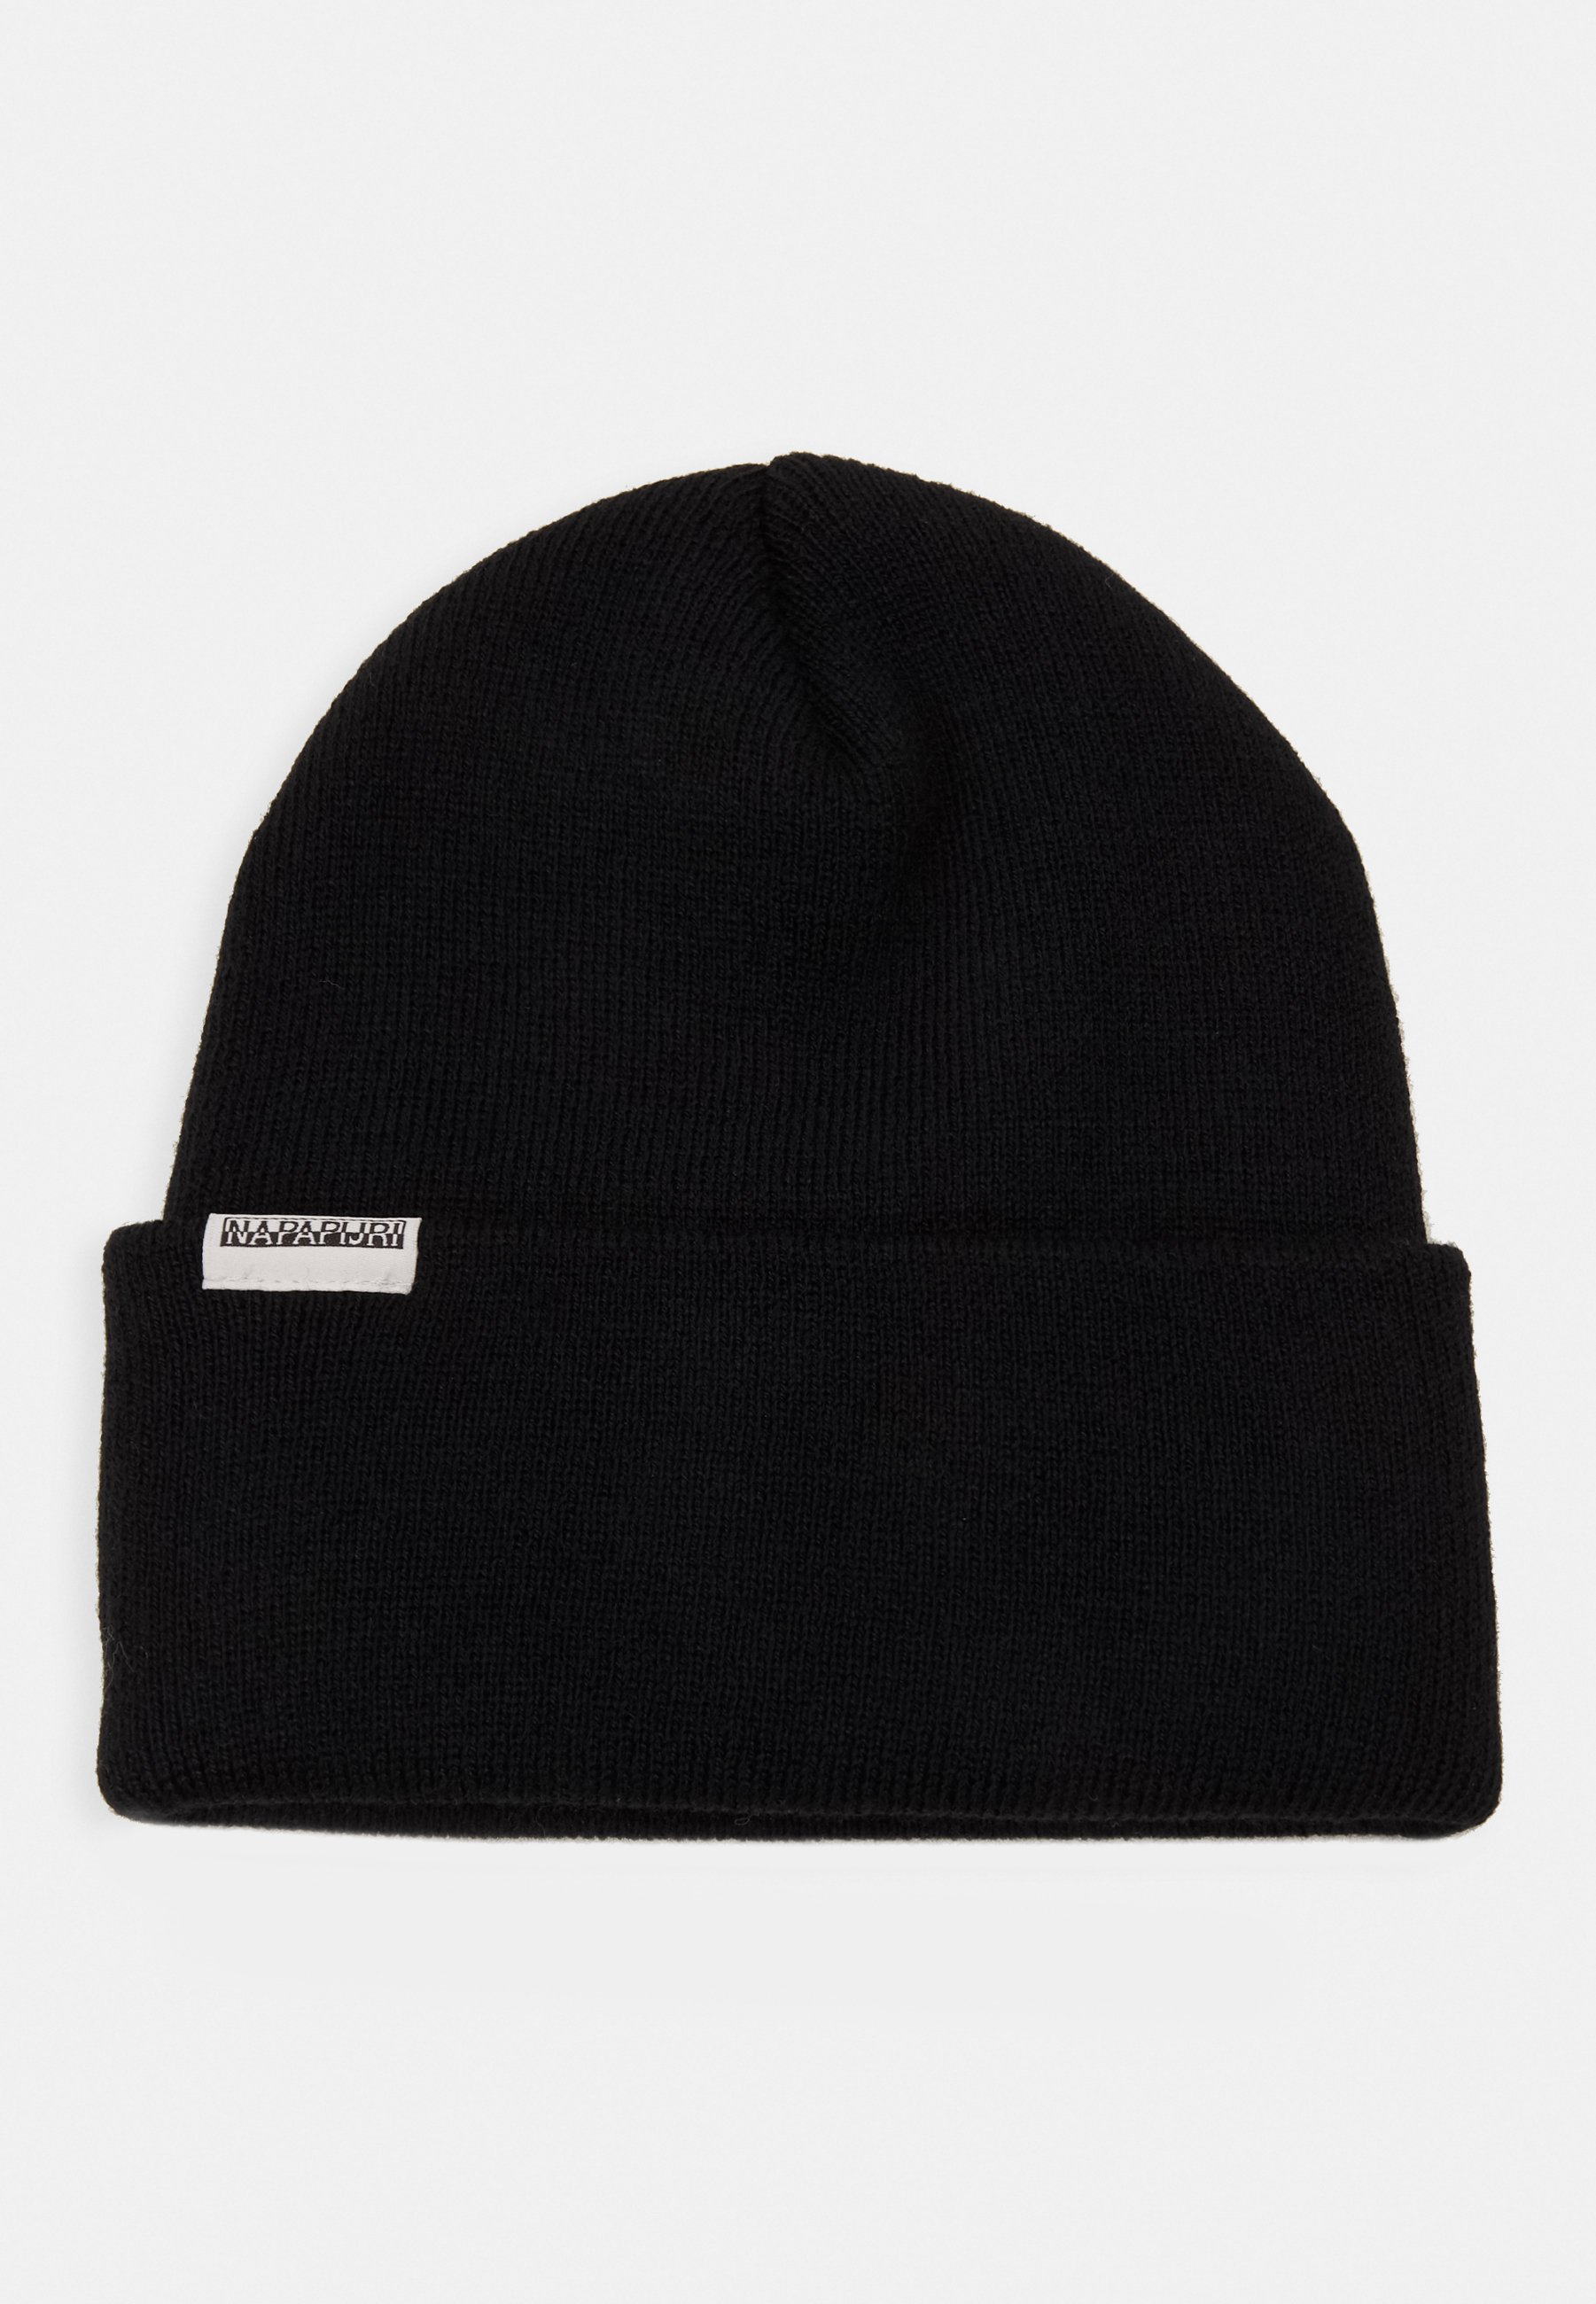 Napapijri Faro - Mütze Black/schwarz